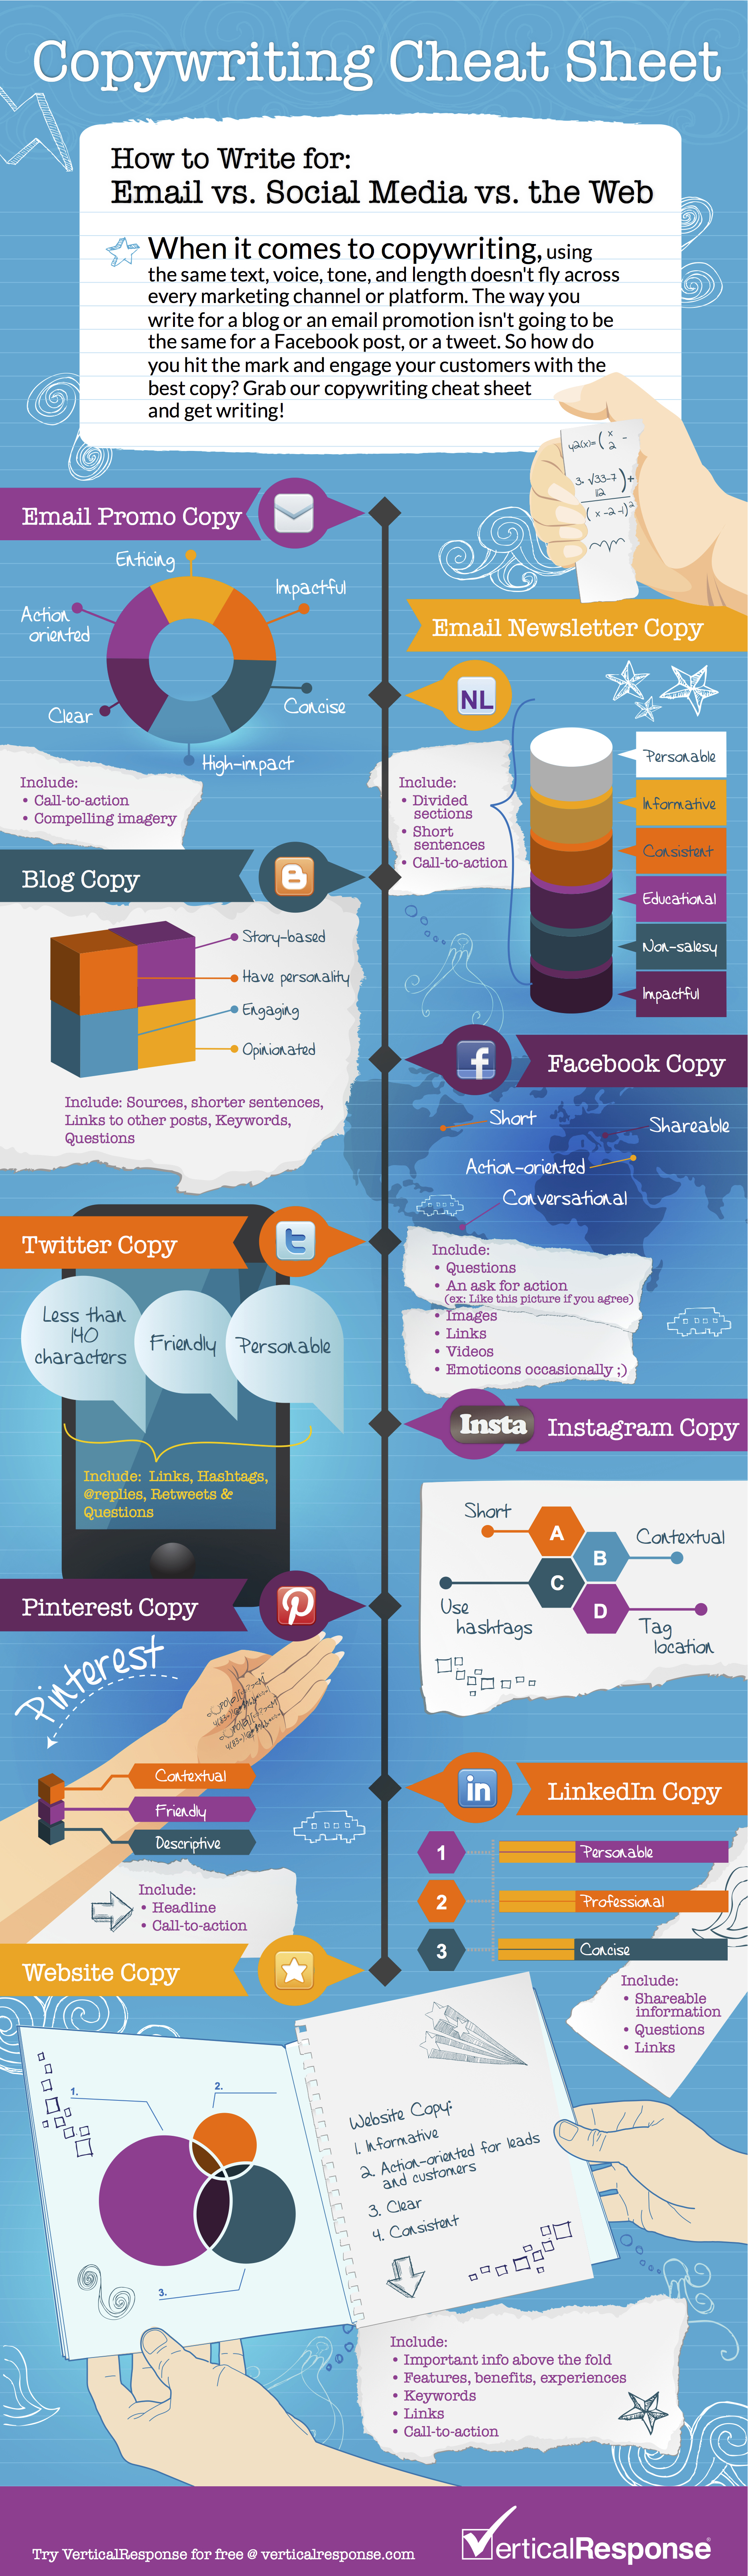 Copywriting cheat sheet infographic